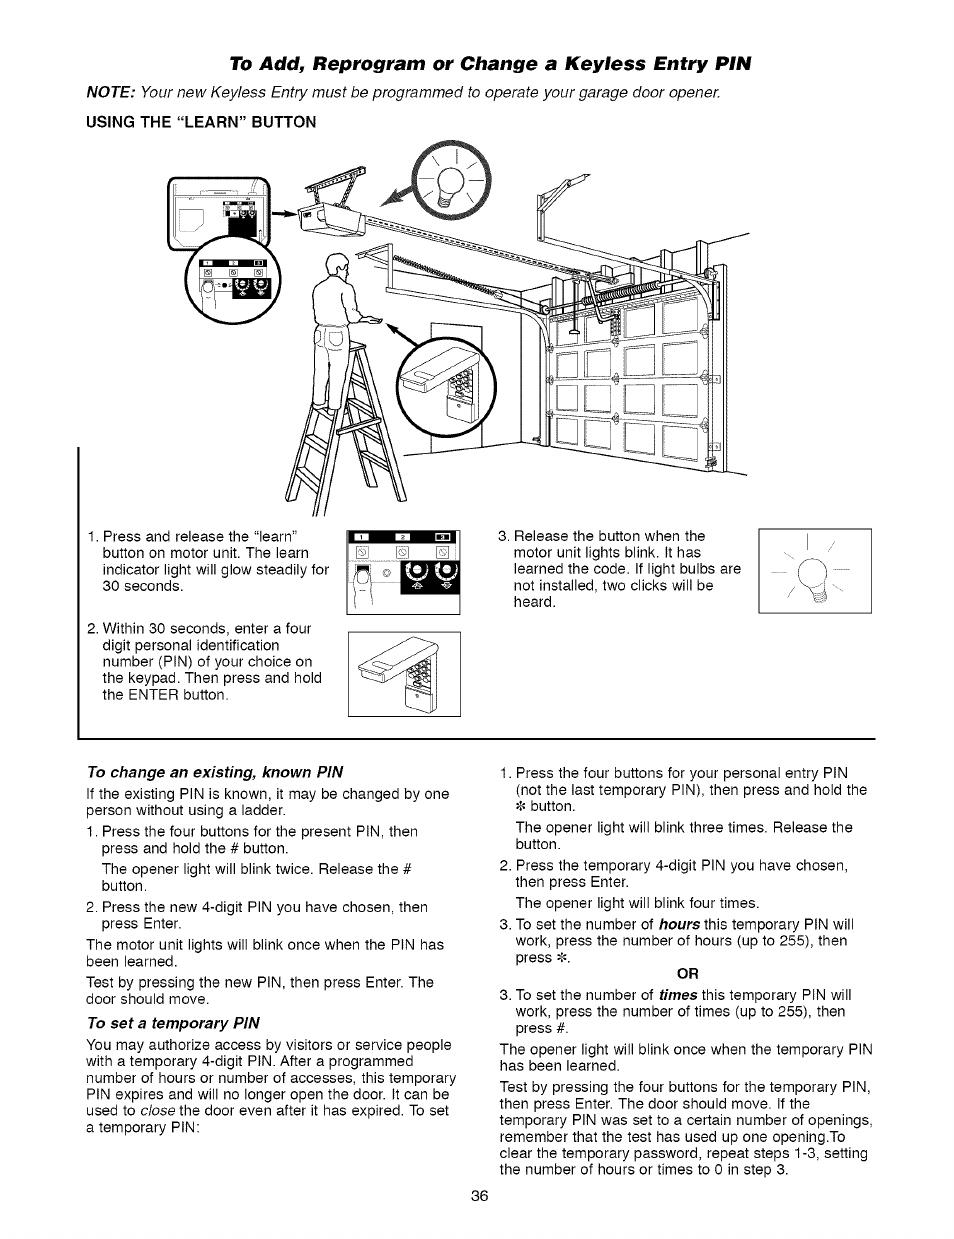 To Add Reprogram Or Change A Keyless Entry Pin Craftsman 1 2 Hp Garage Door Opener Model 139 5364812 User Manual Page 36 40